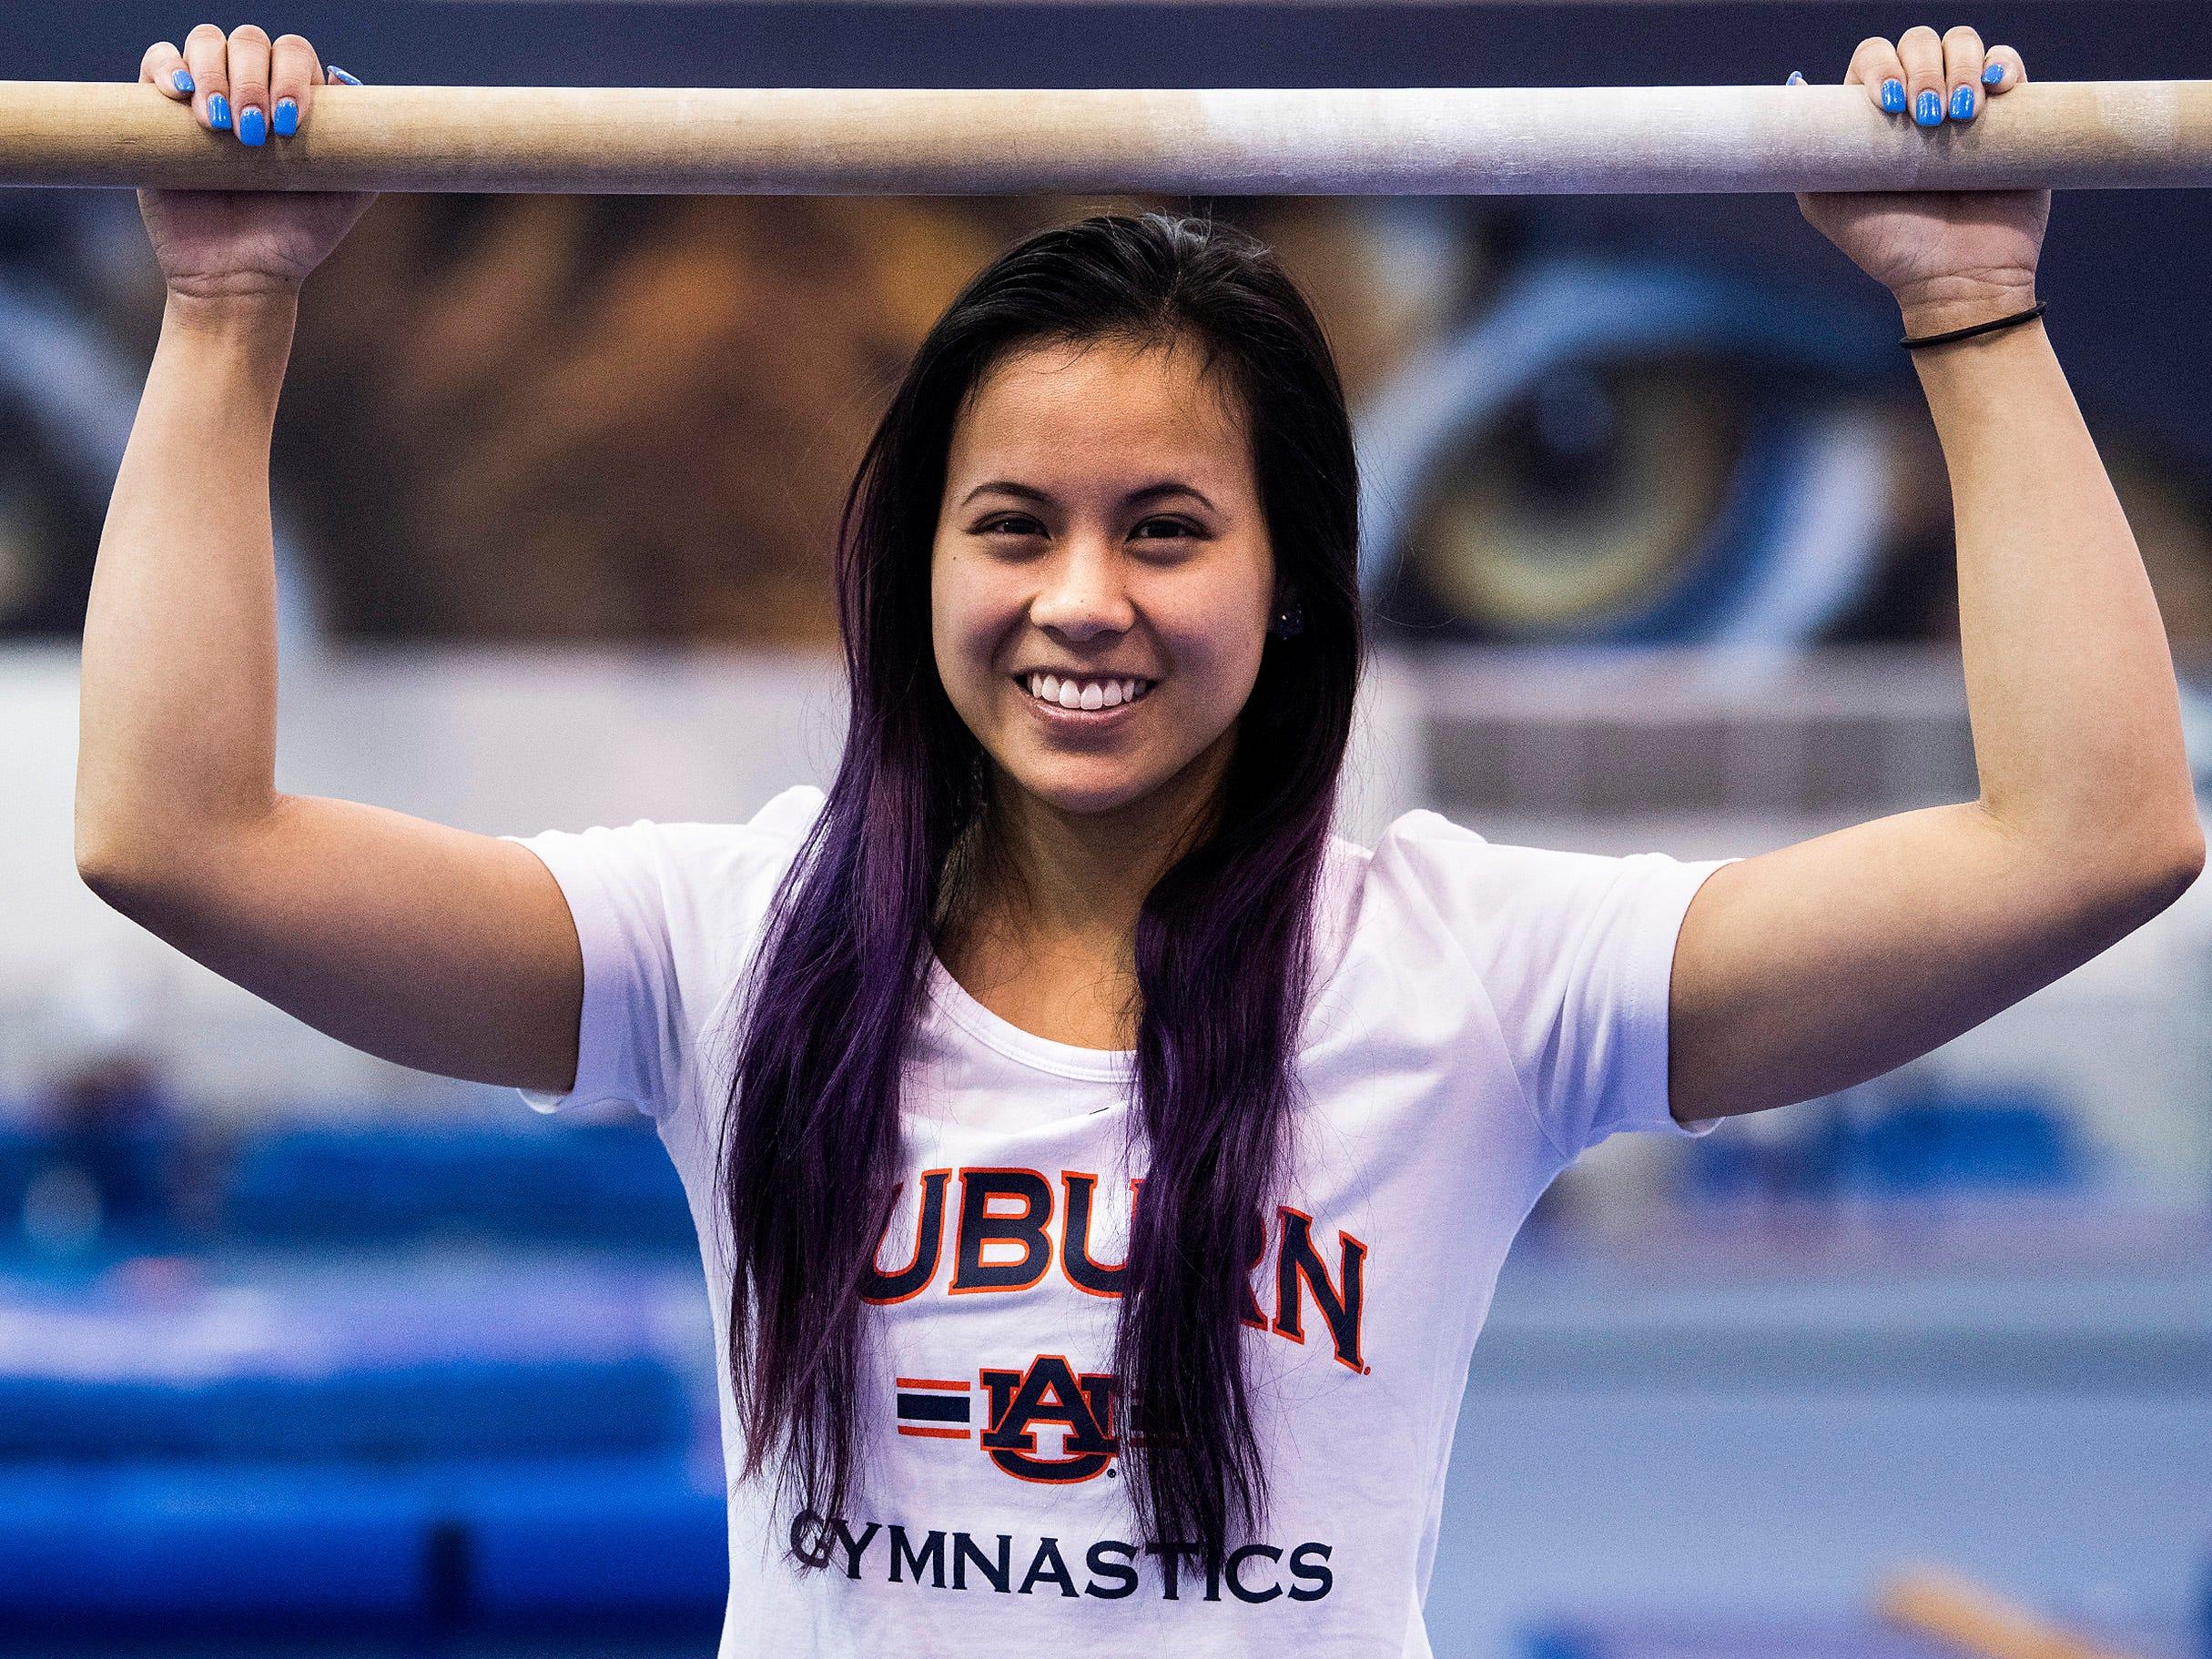 Auburn university gymnast Sam Cerio is seen in the women's gymnastics practice facility on the AU campus in Auburn, Ala., on Thursday May 9, 2019.